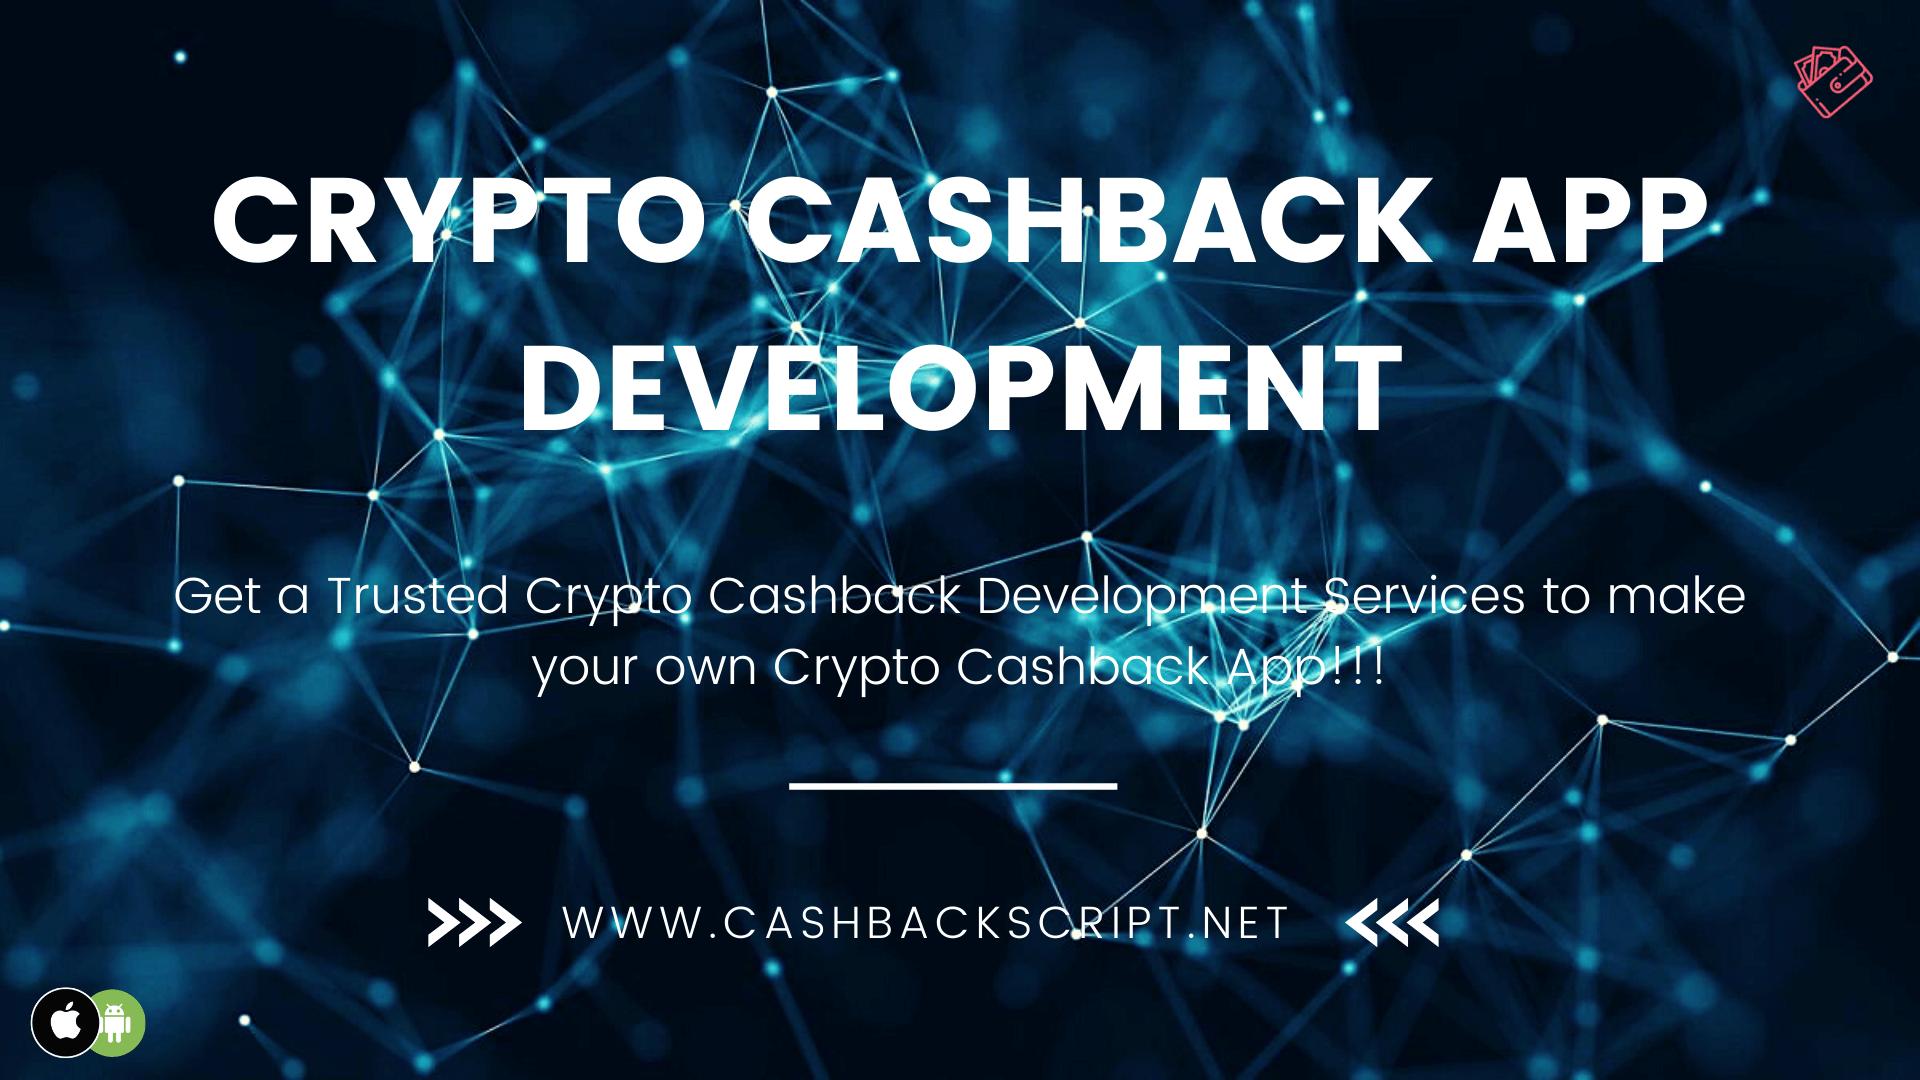 Crypto Cashback App Development to Kick Start your Crypto Cashback Reward Business